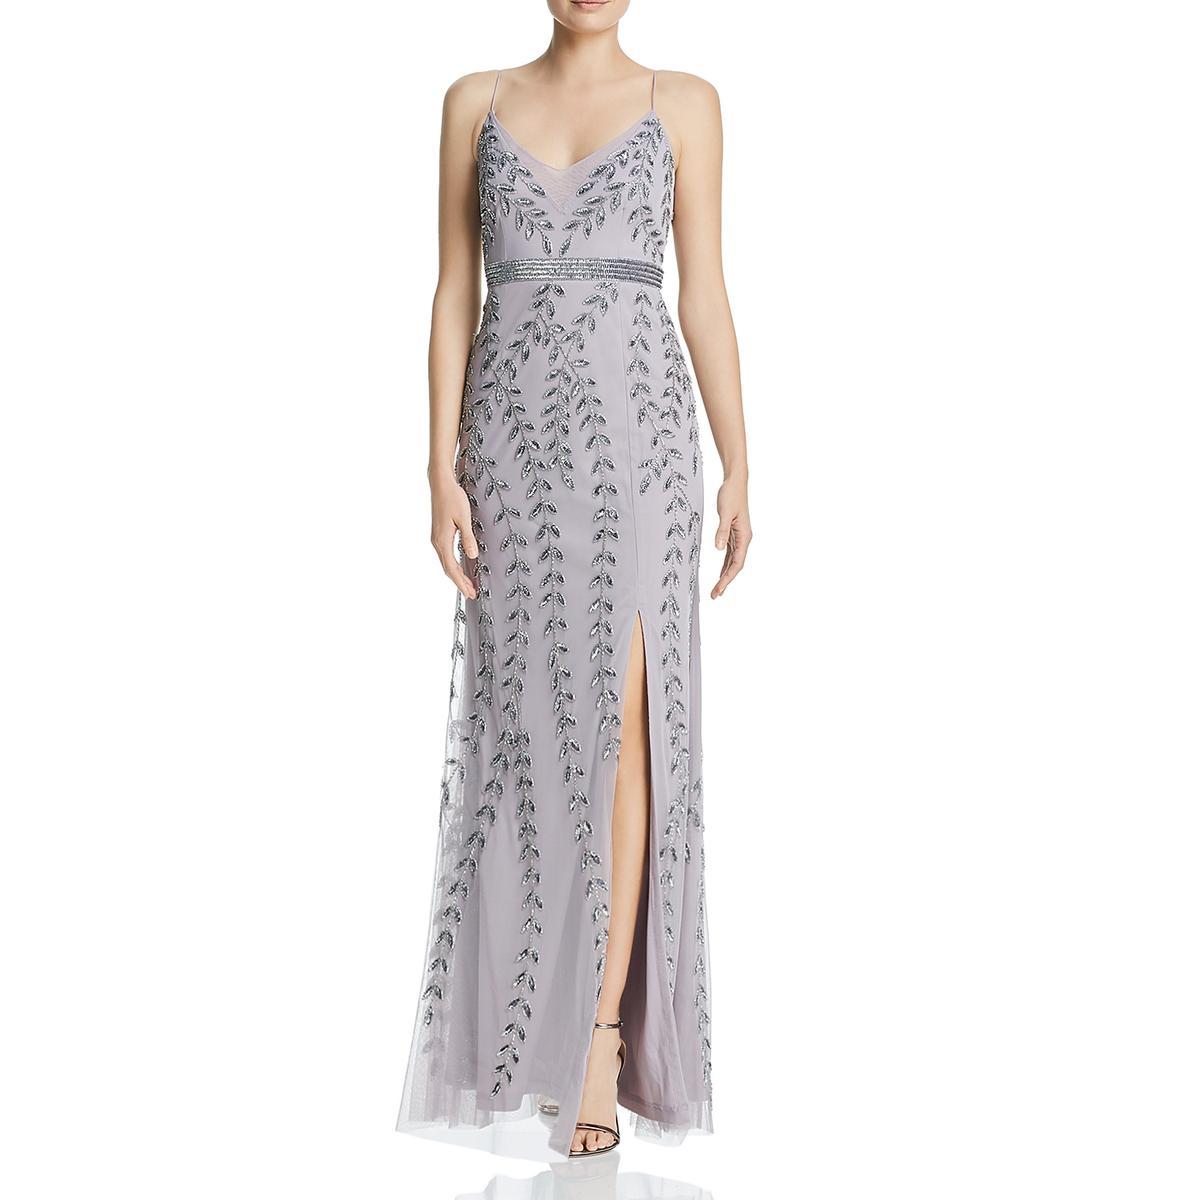 Keepsake Womens Shadow Stripe Sleeveless Formal Evening Dress Gown BHFO 6271